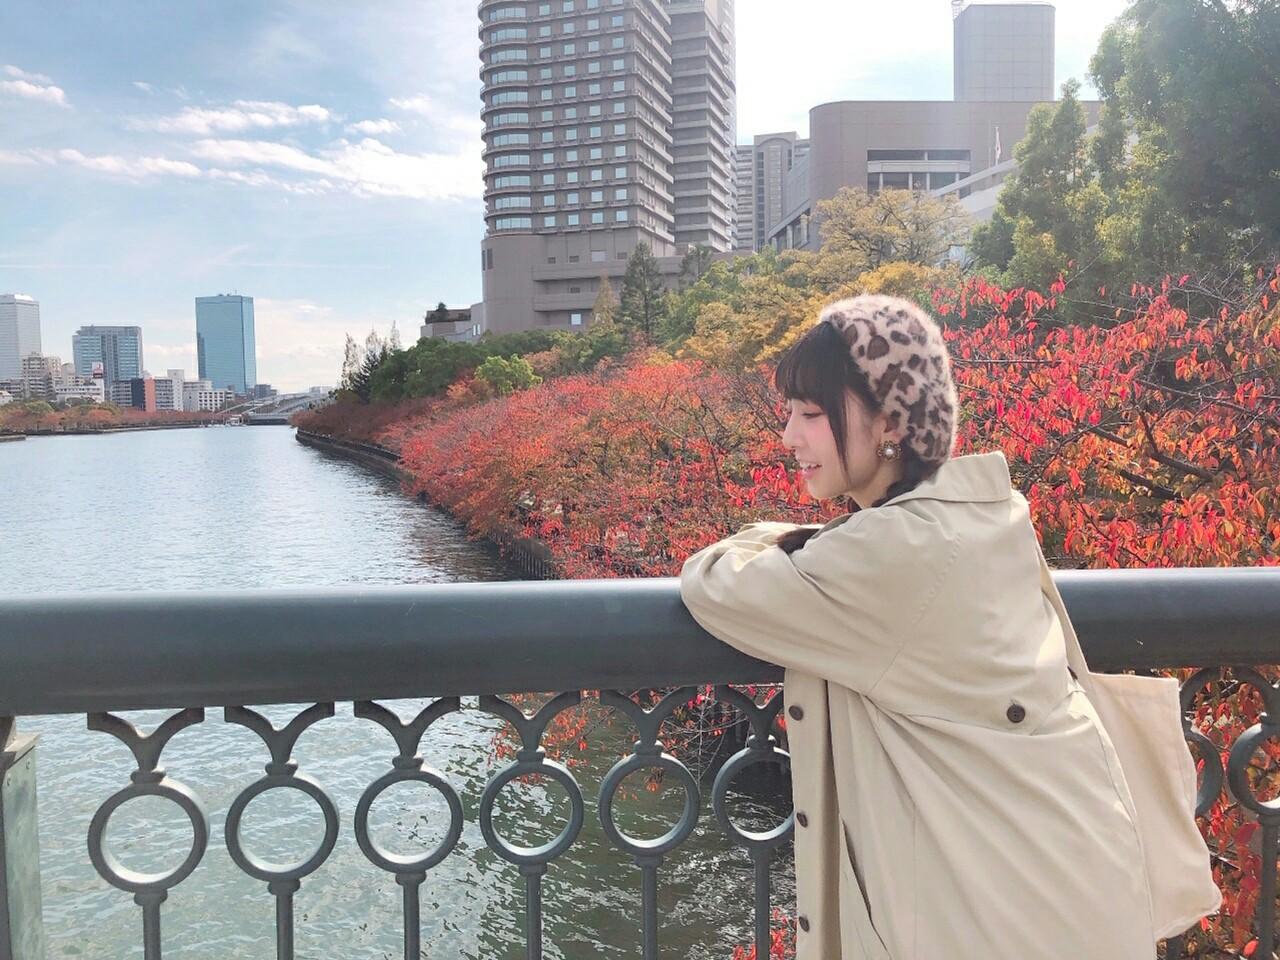 f:id:asitaha46:20181128012448j:image